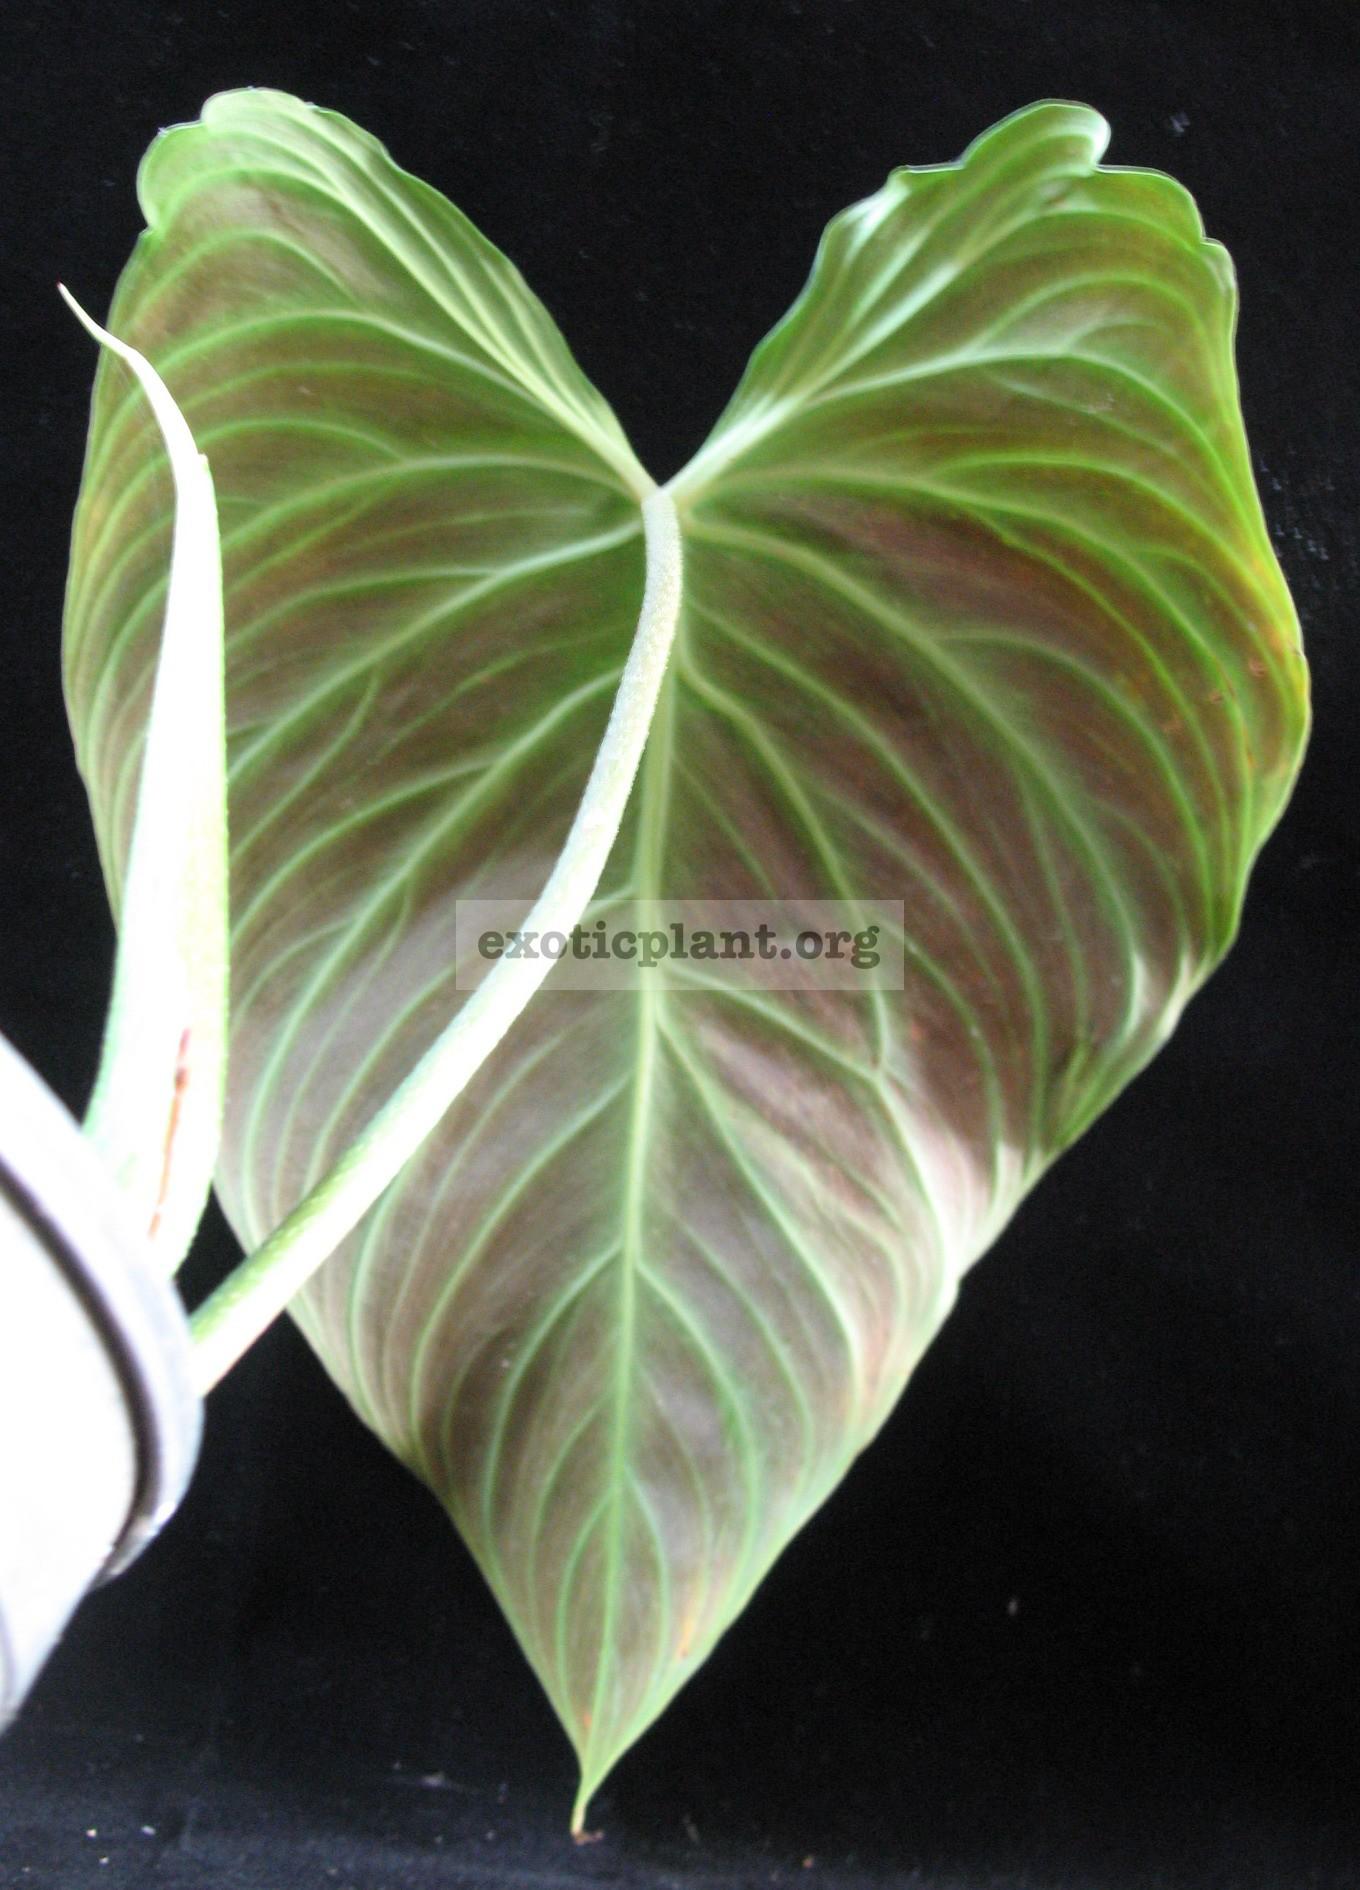 Philodendron andreanum x verrucosum /  гибрид филодендрона Андрэ и филодендрона веррукозума (бородавчатого) 44